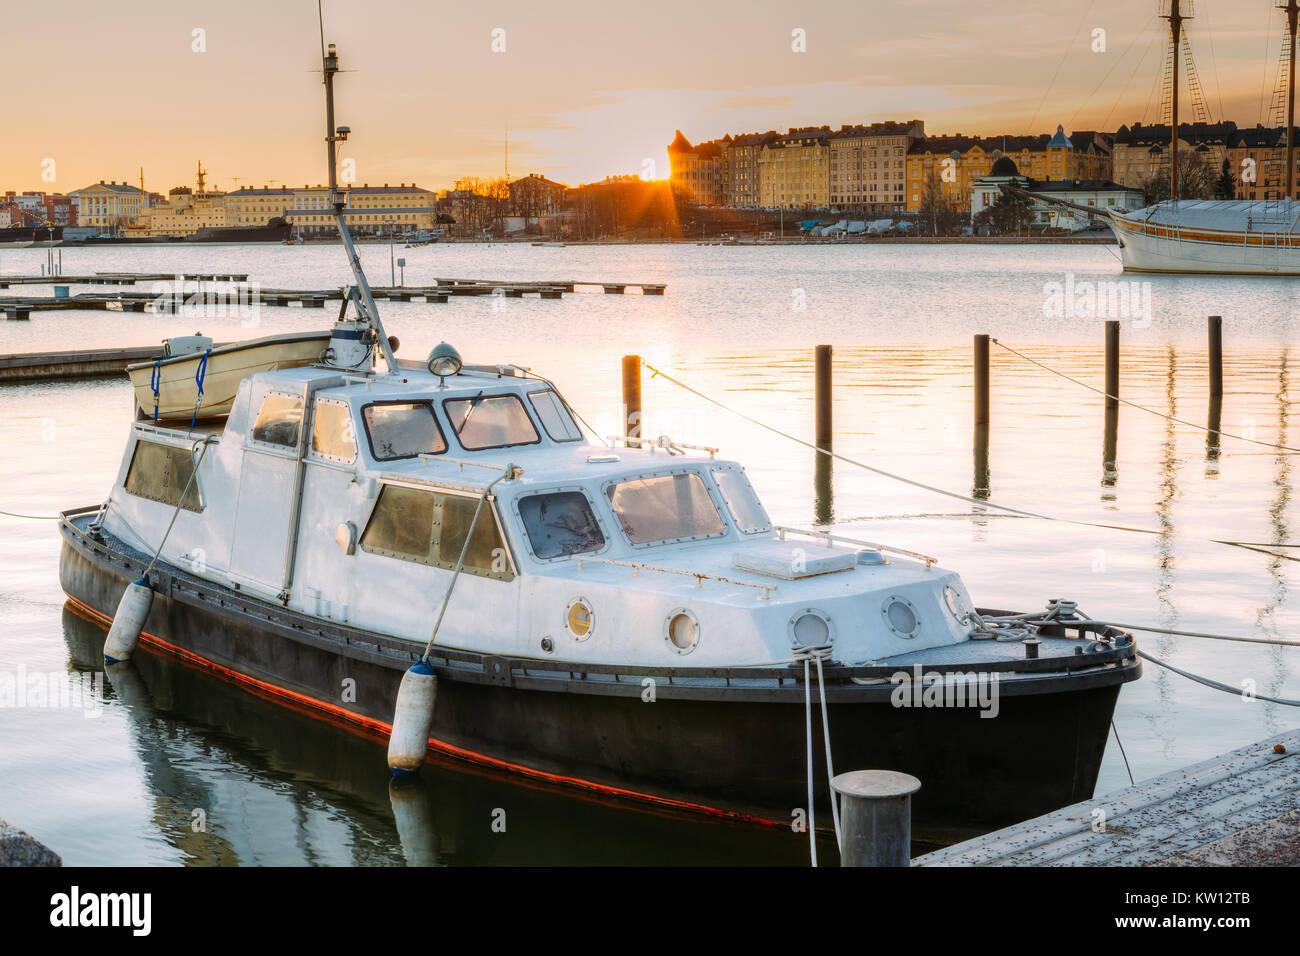 Helsinki, Finnland. Marine Boot, Motorboot vertäut an Liegeplätzen in den Sonnenaufgang im Winter morgens. Stockbild